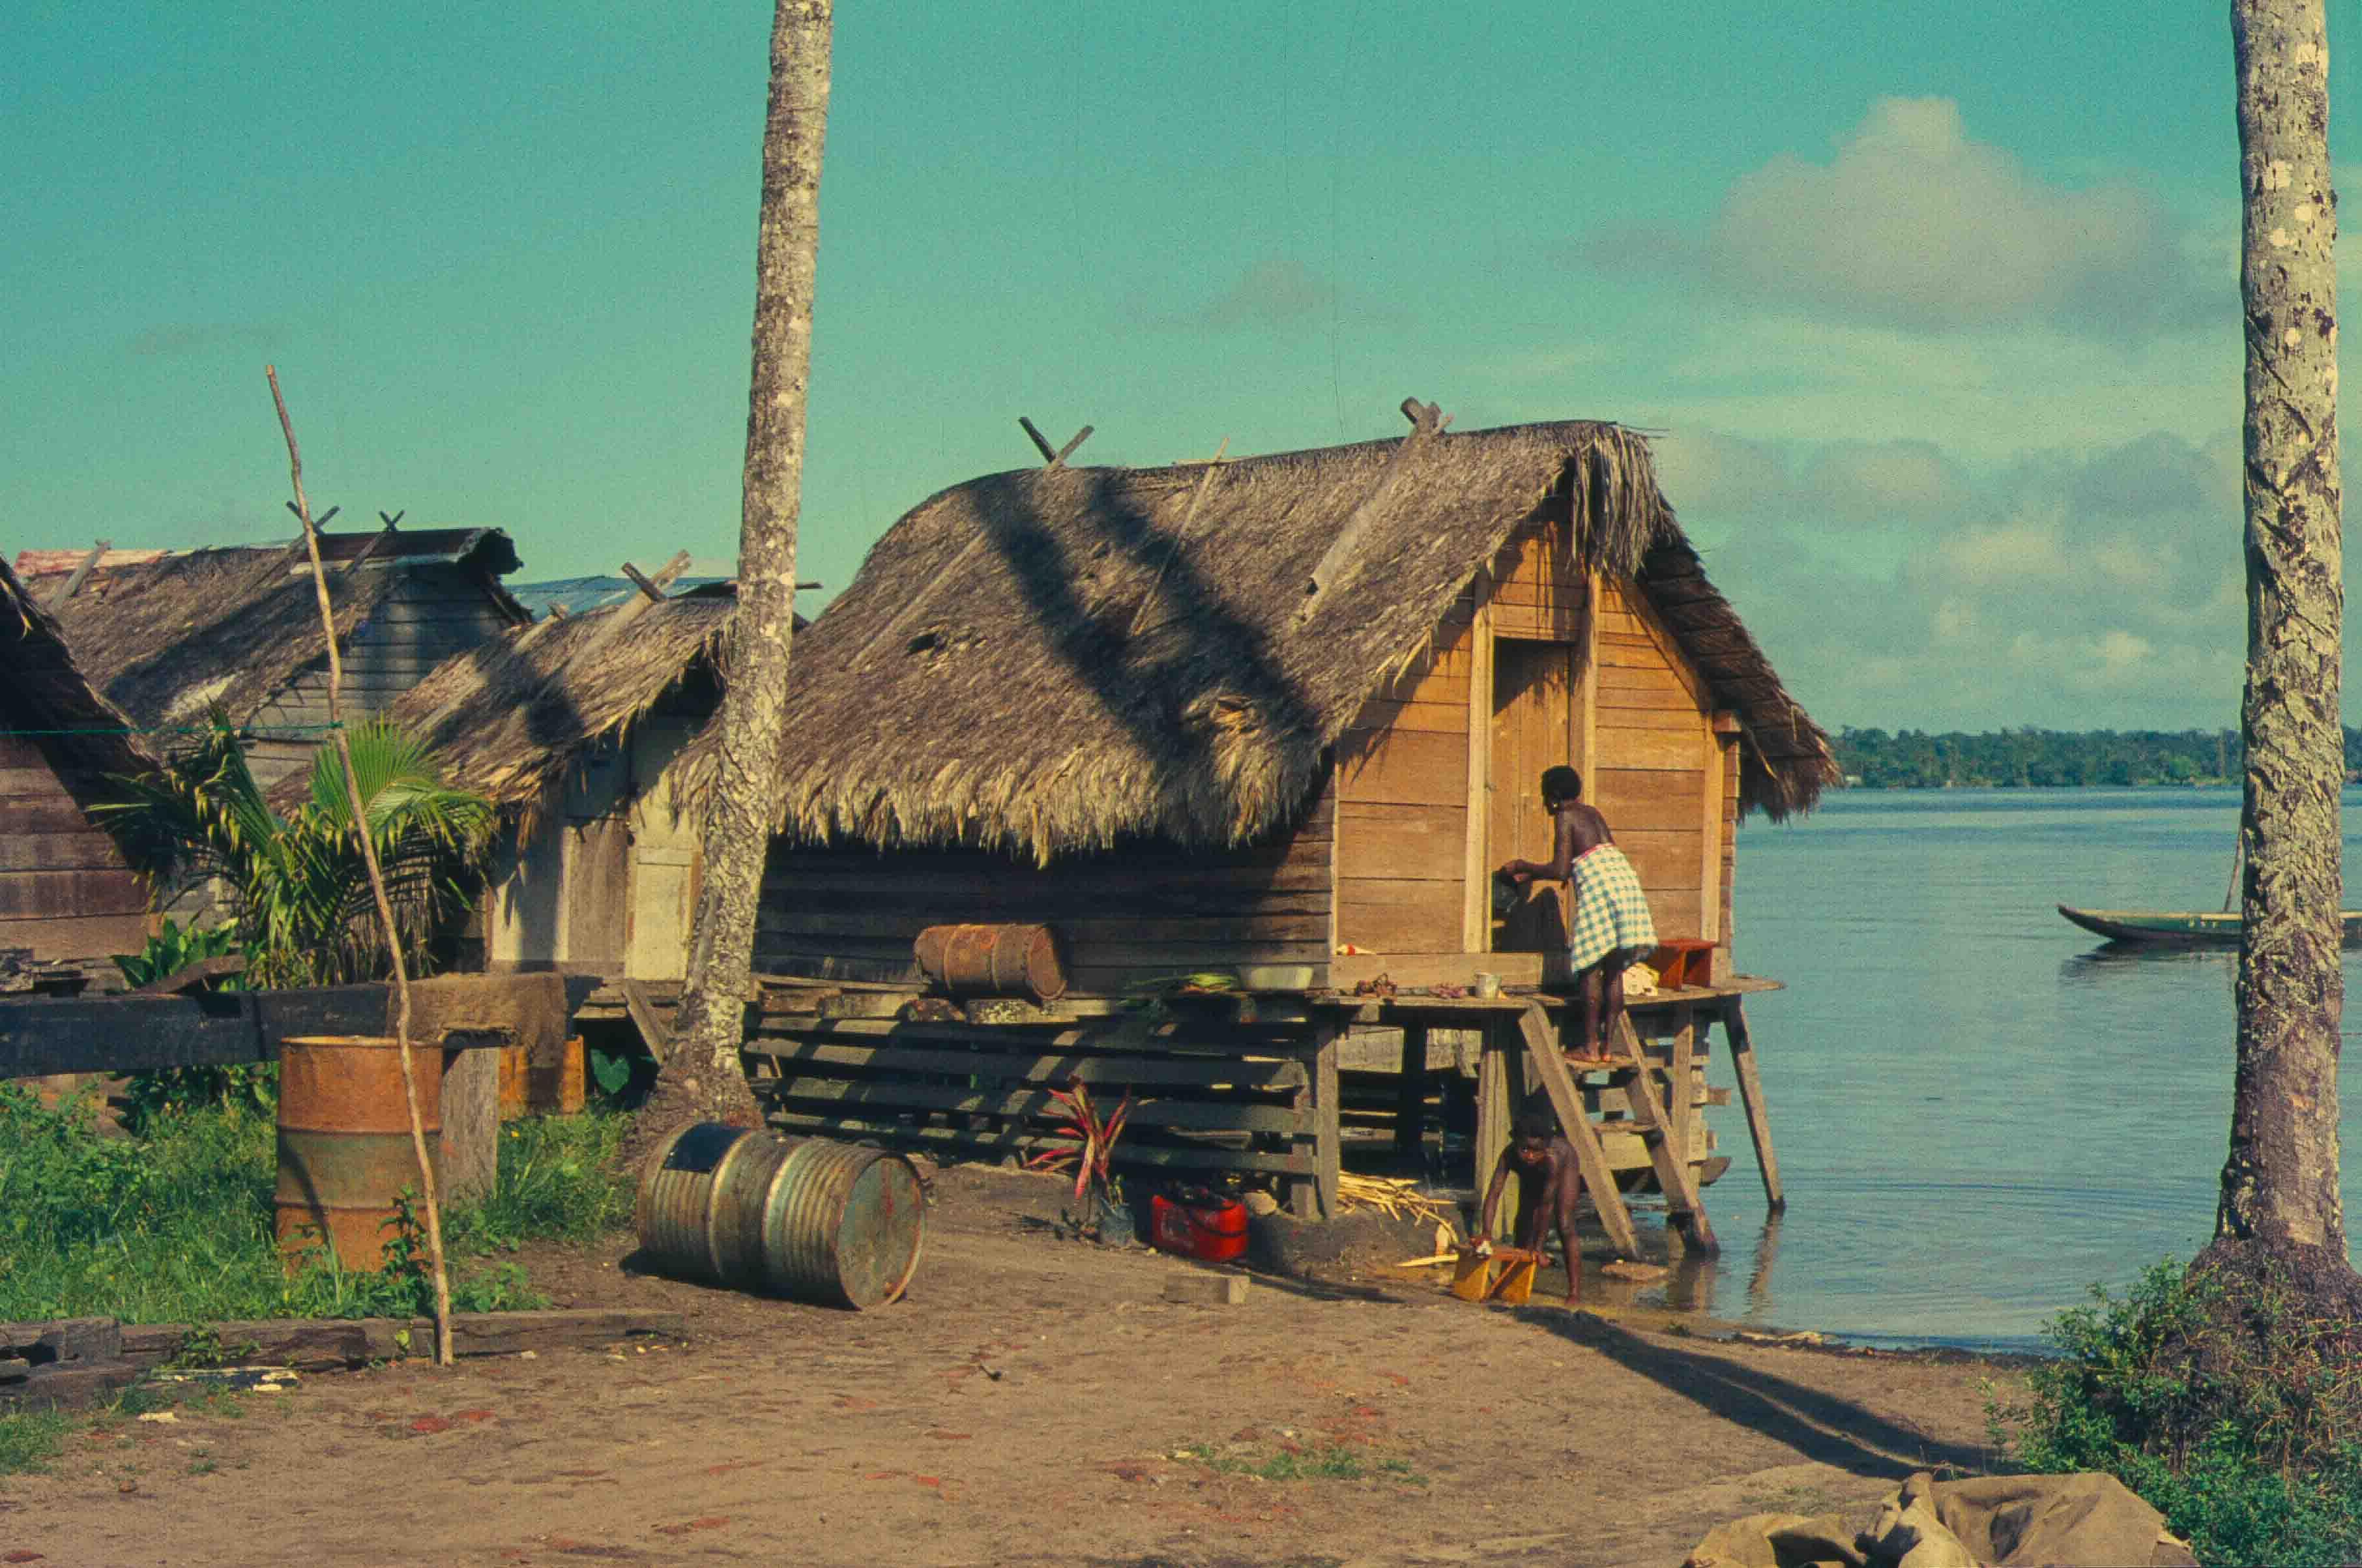 448. Suriname